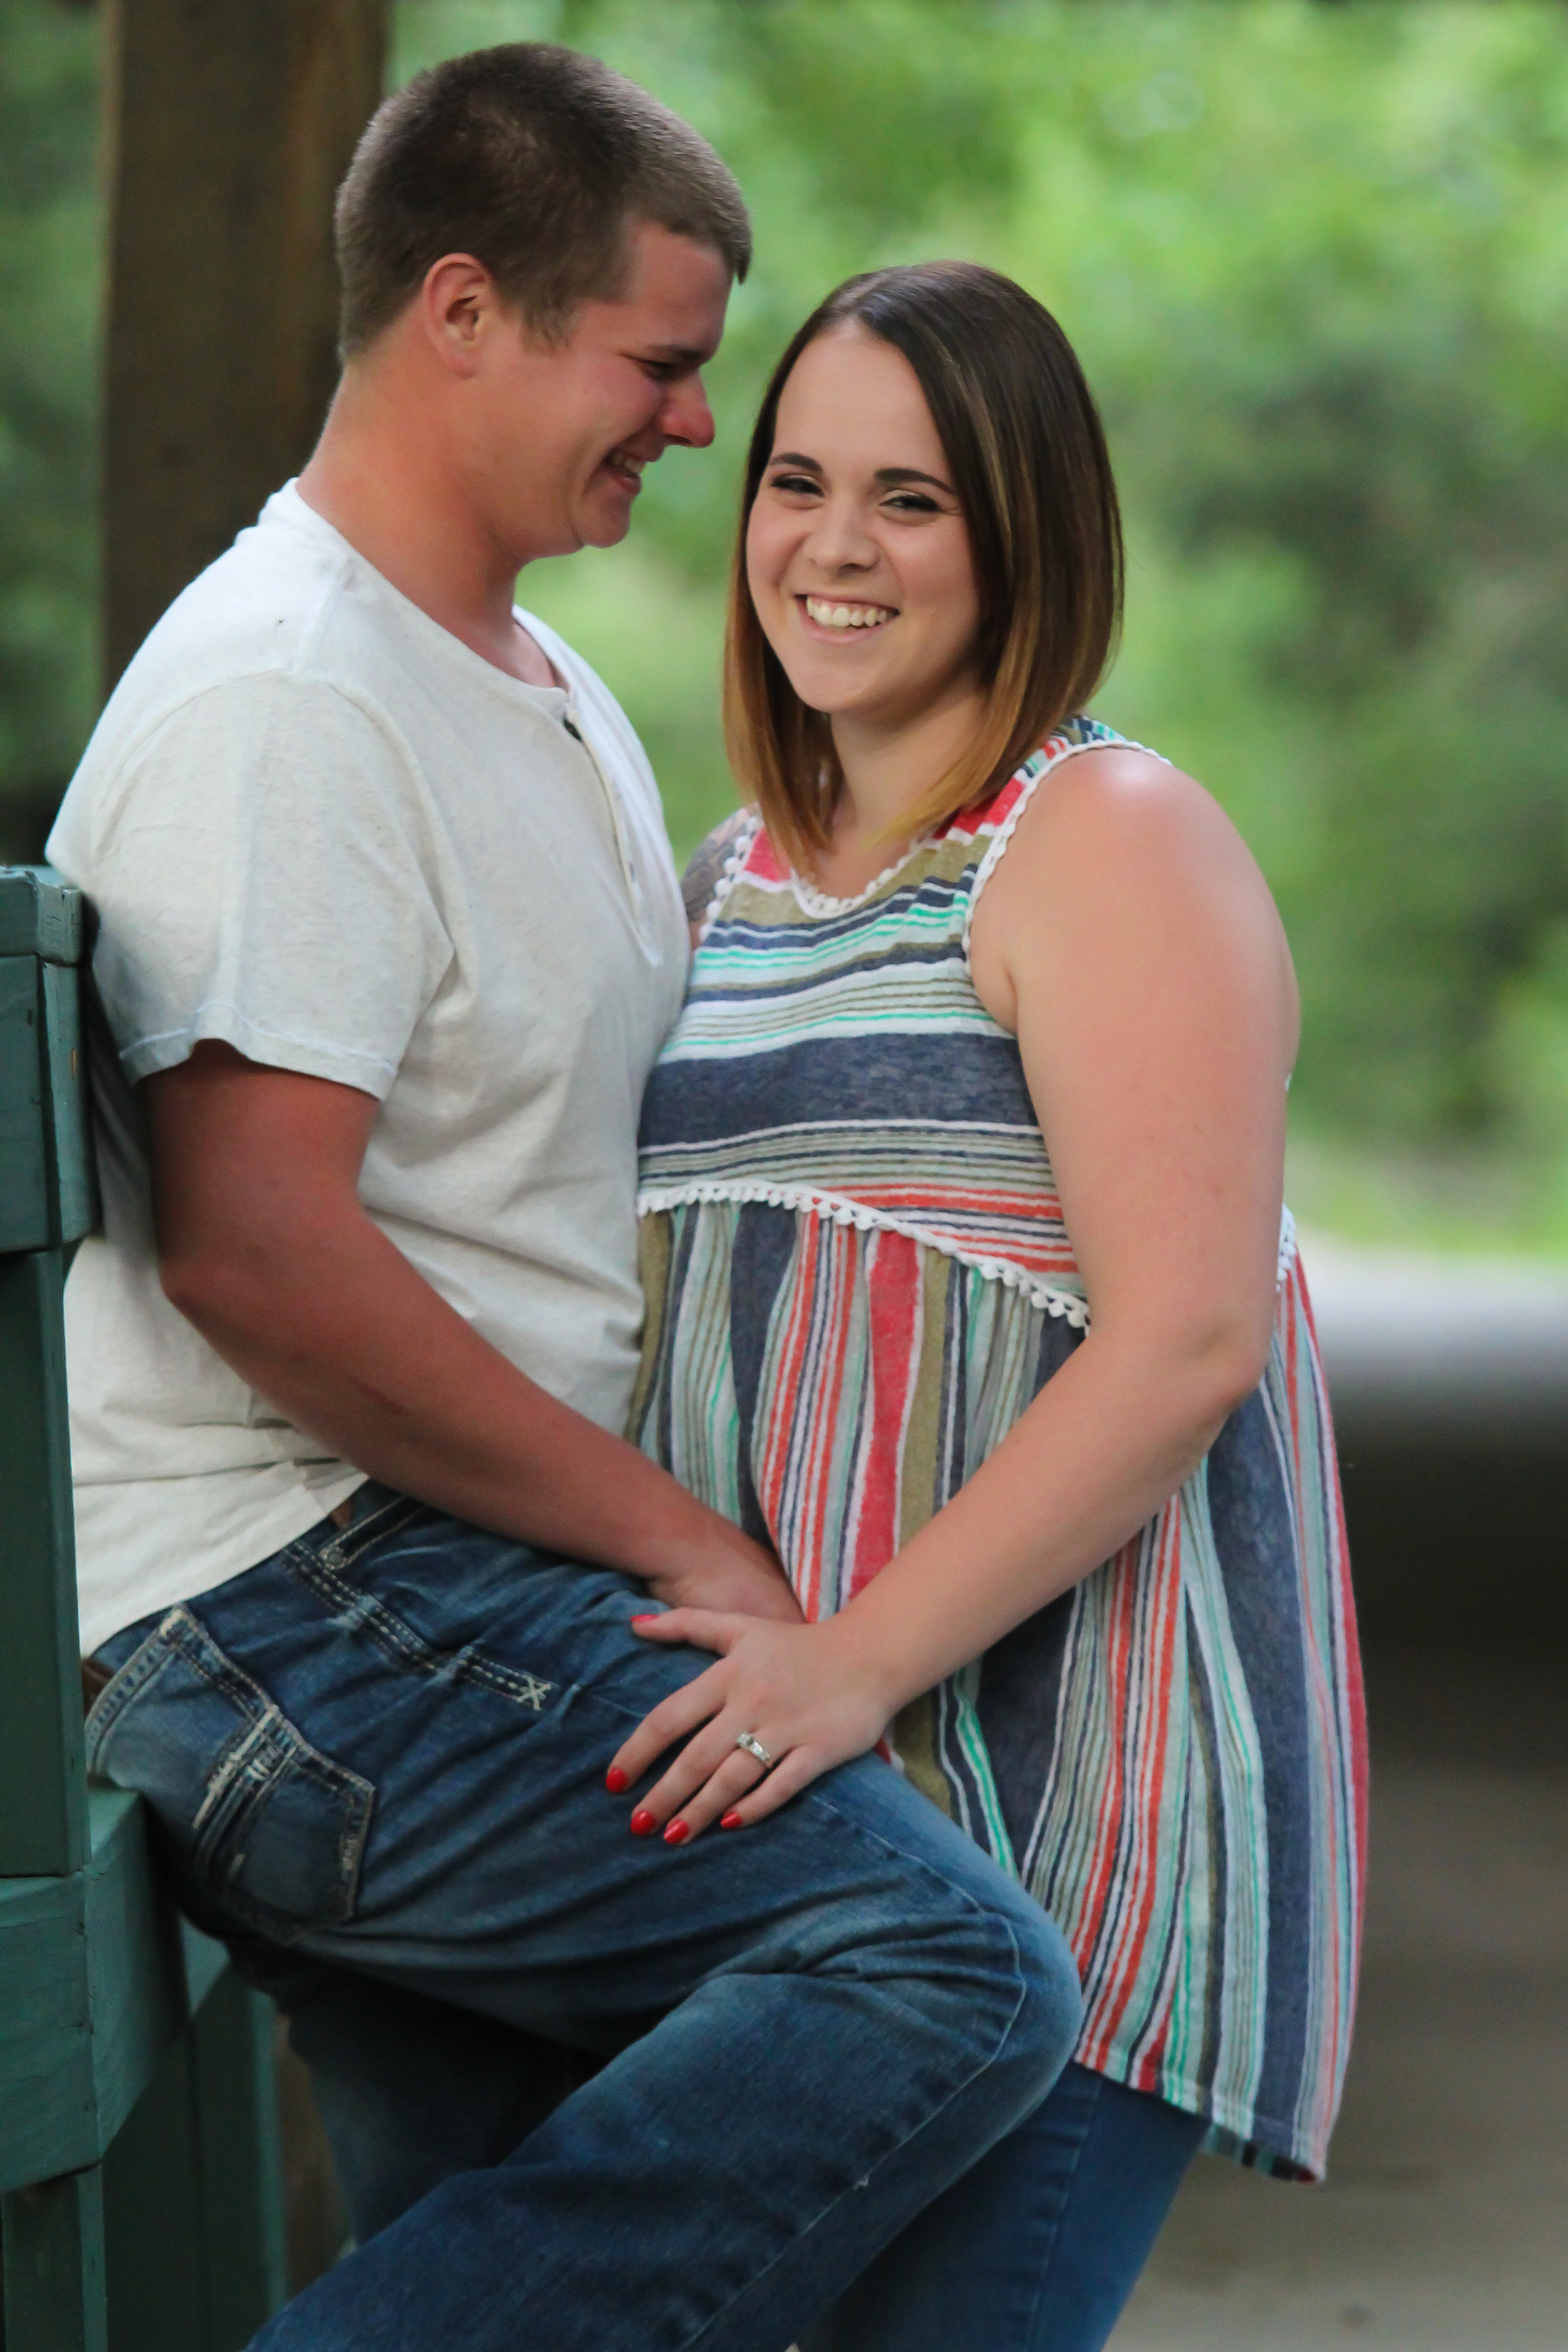 Engagement & Wedding Photographer, Wichita, Ks. Avid Artistry